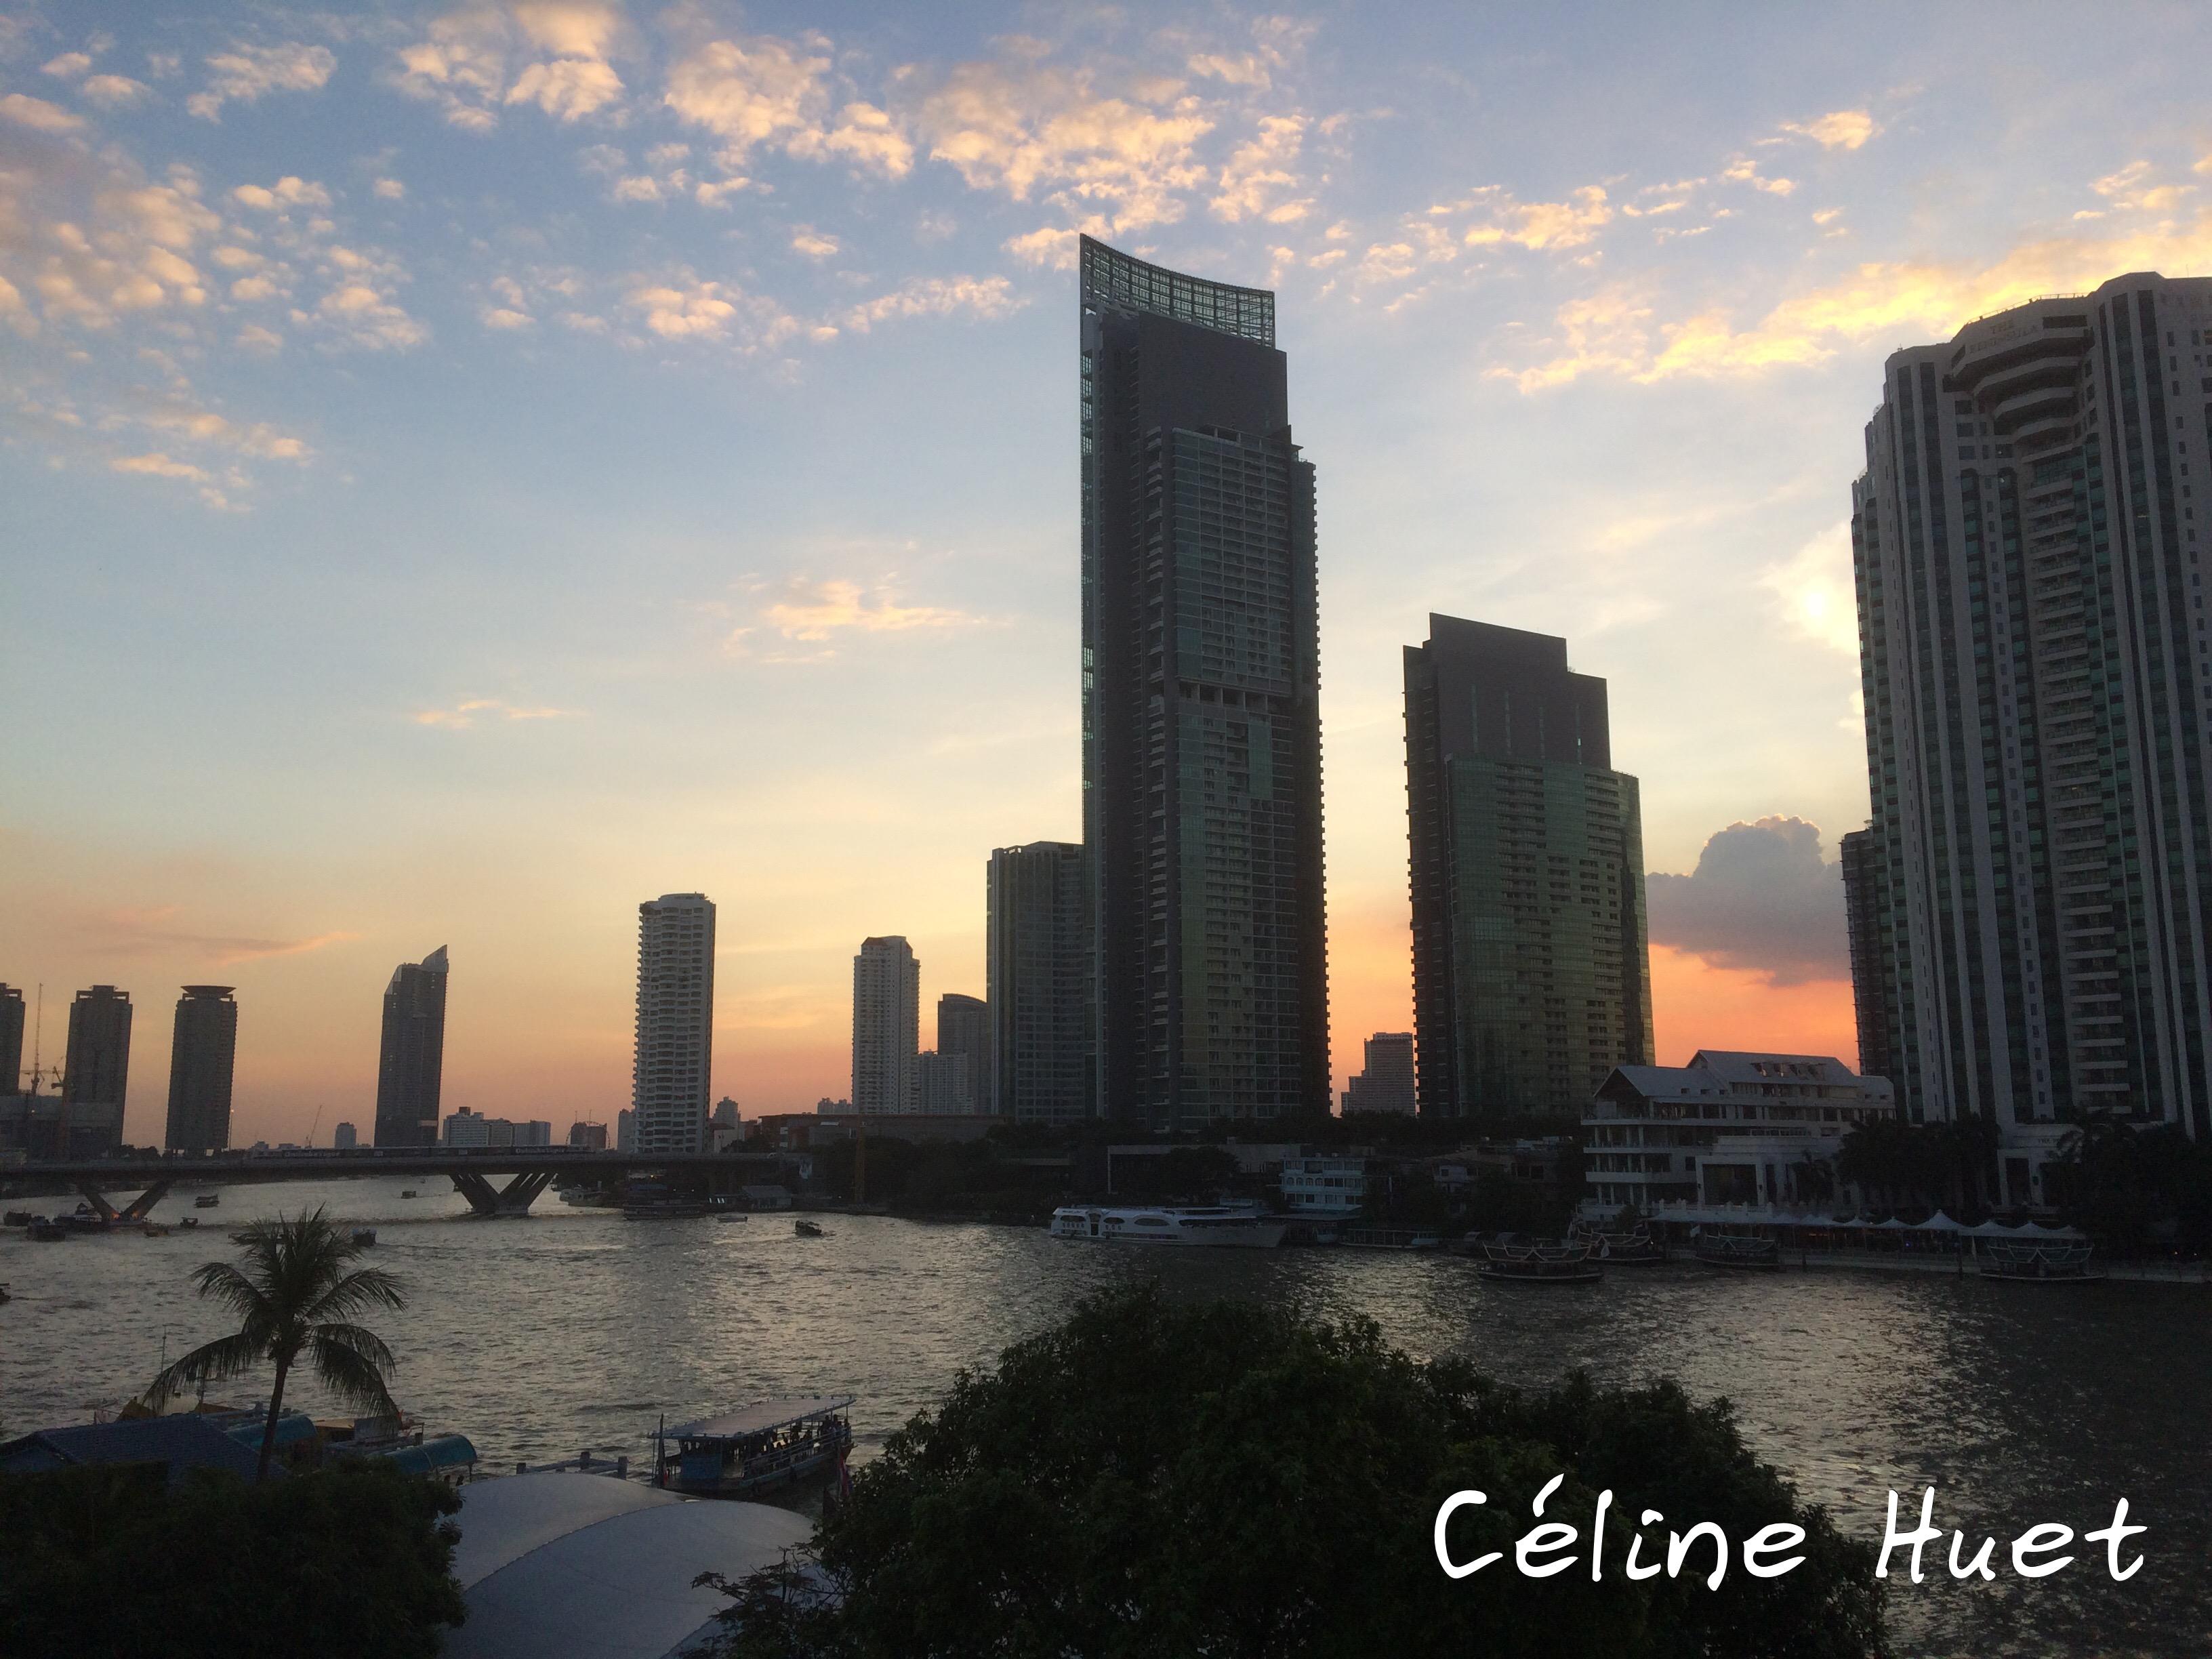 Coucher de soleil sur le Chao Praya depuis le MO BKK Bangkok Thaïlande Asie